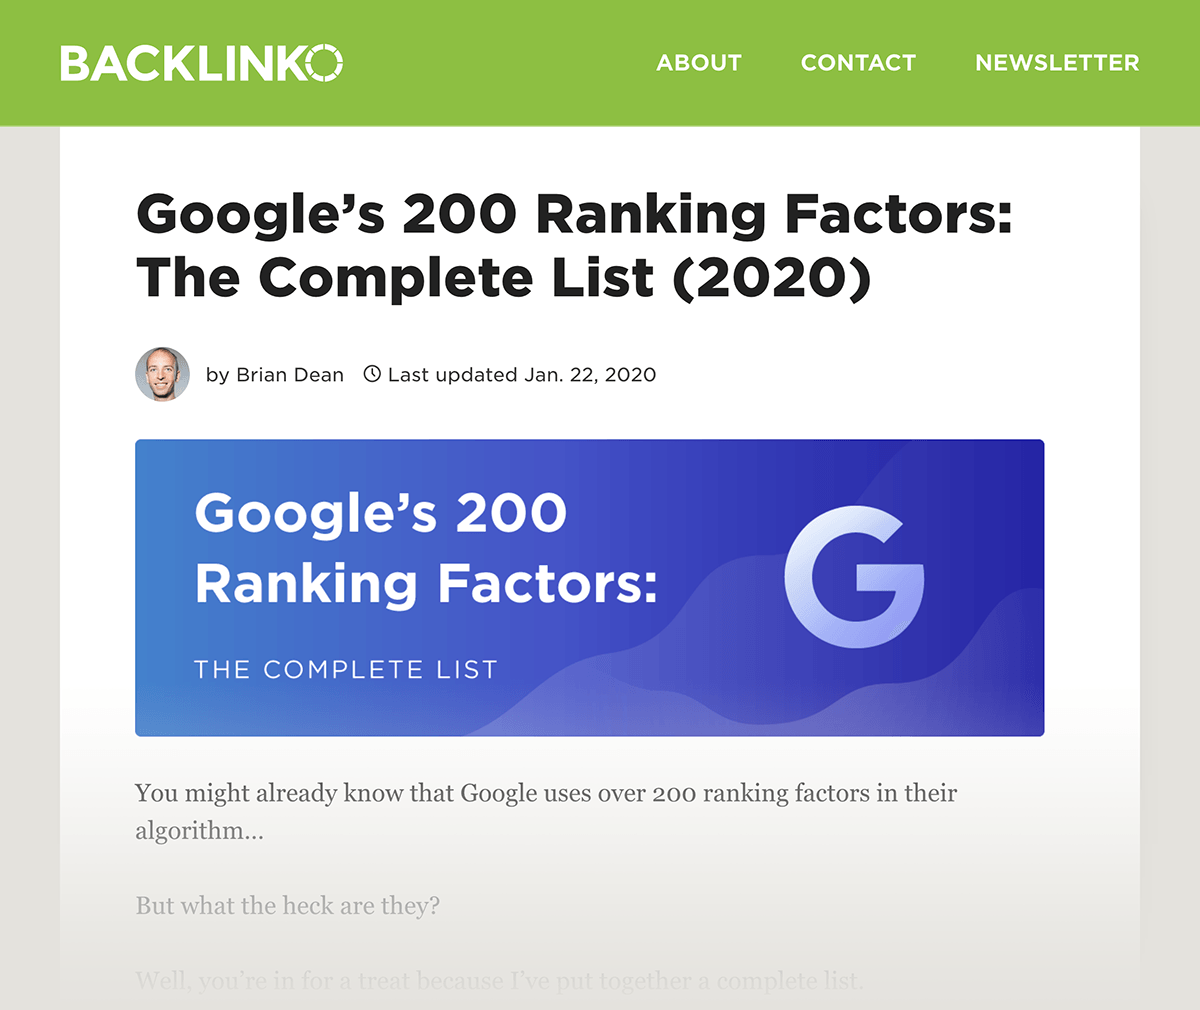 Backlinko – Google's 200 ranking factors